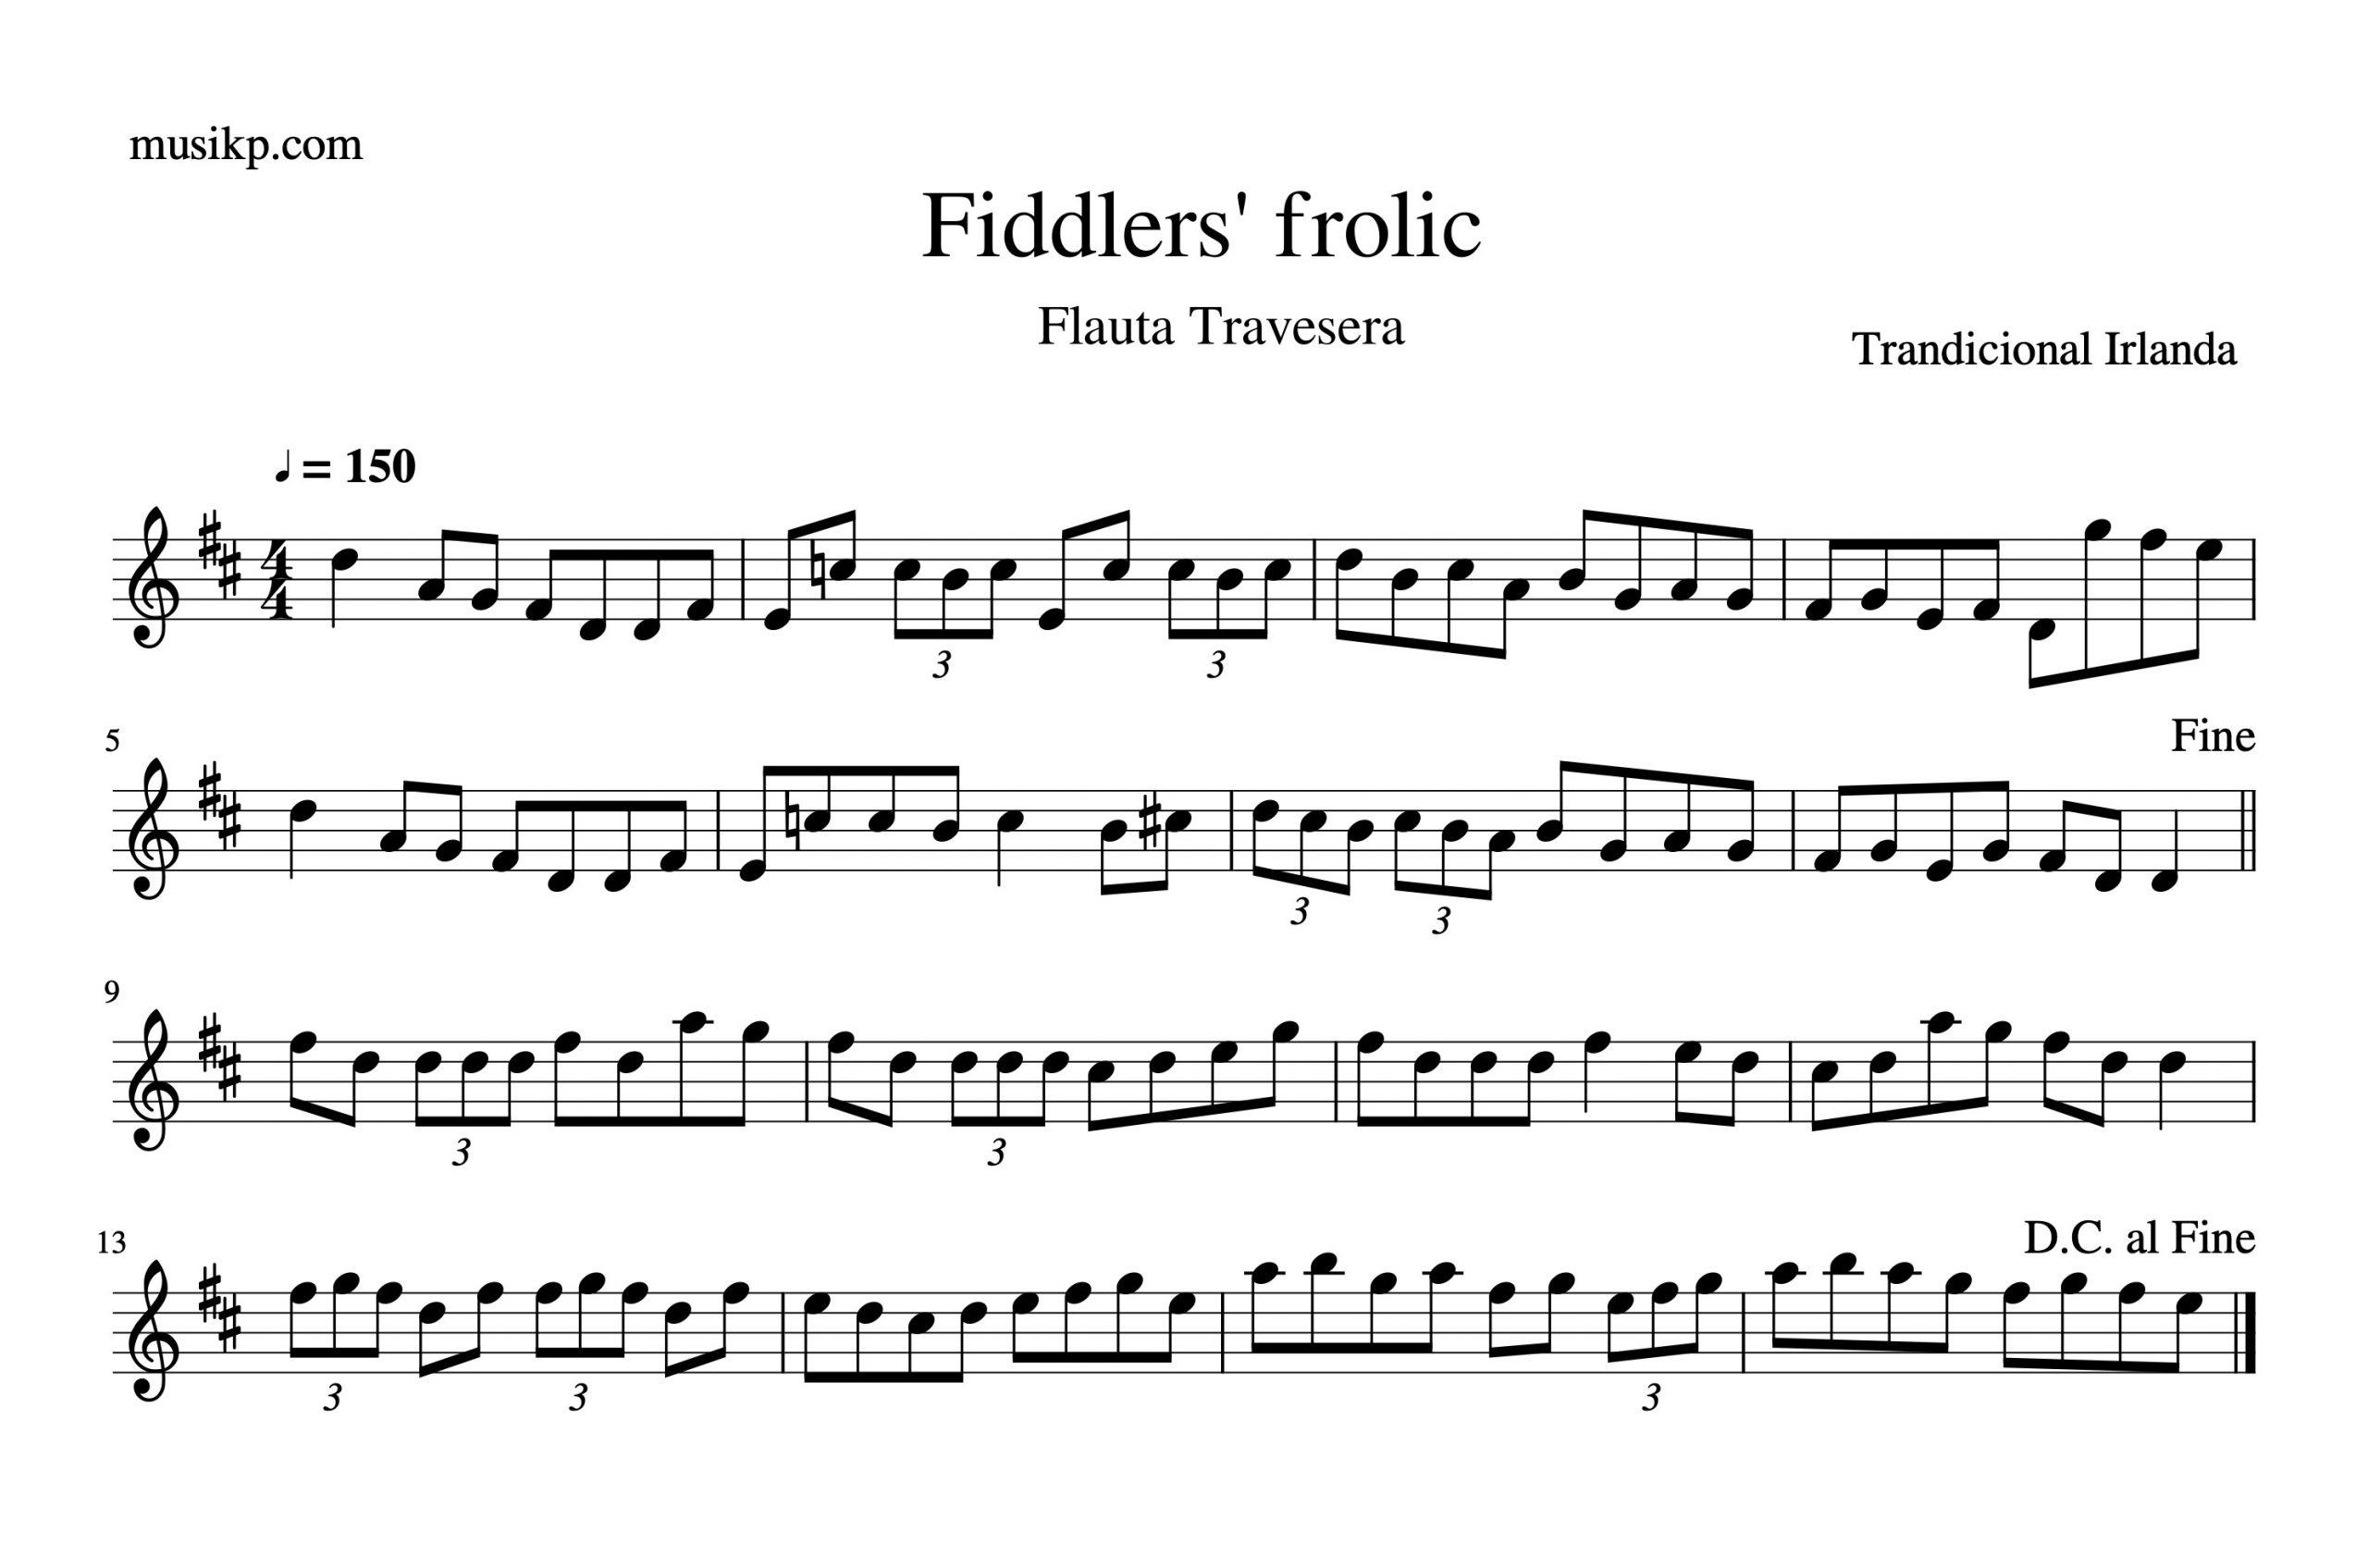 Fiddlers' frolic - partitura flauta travesera